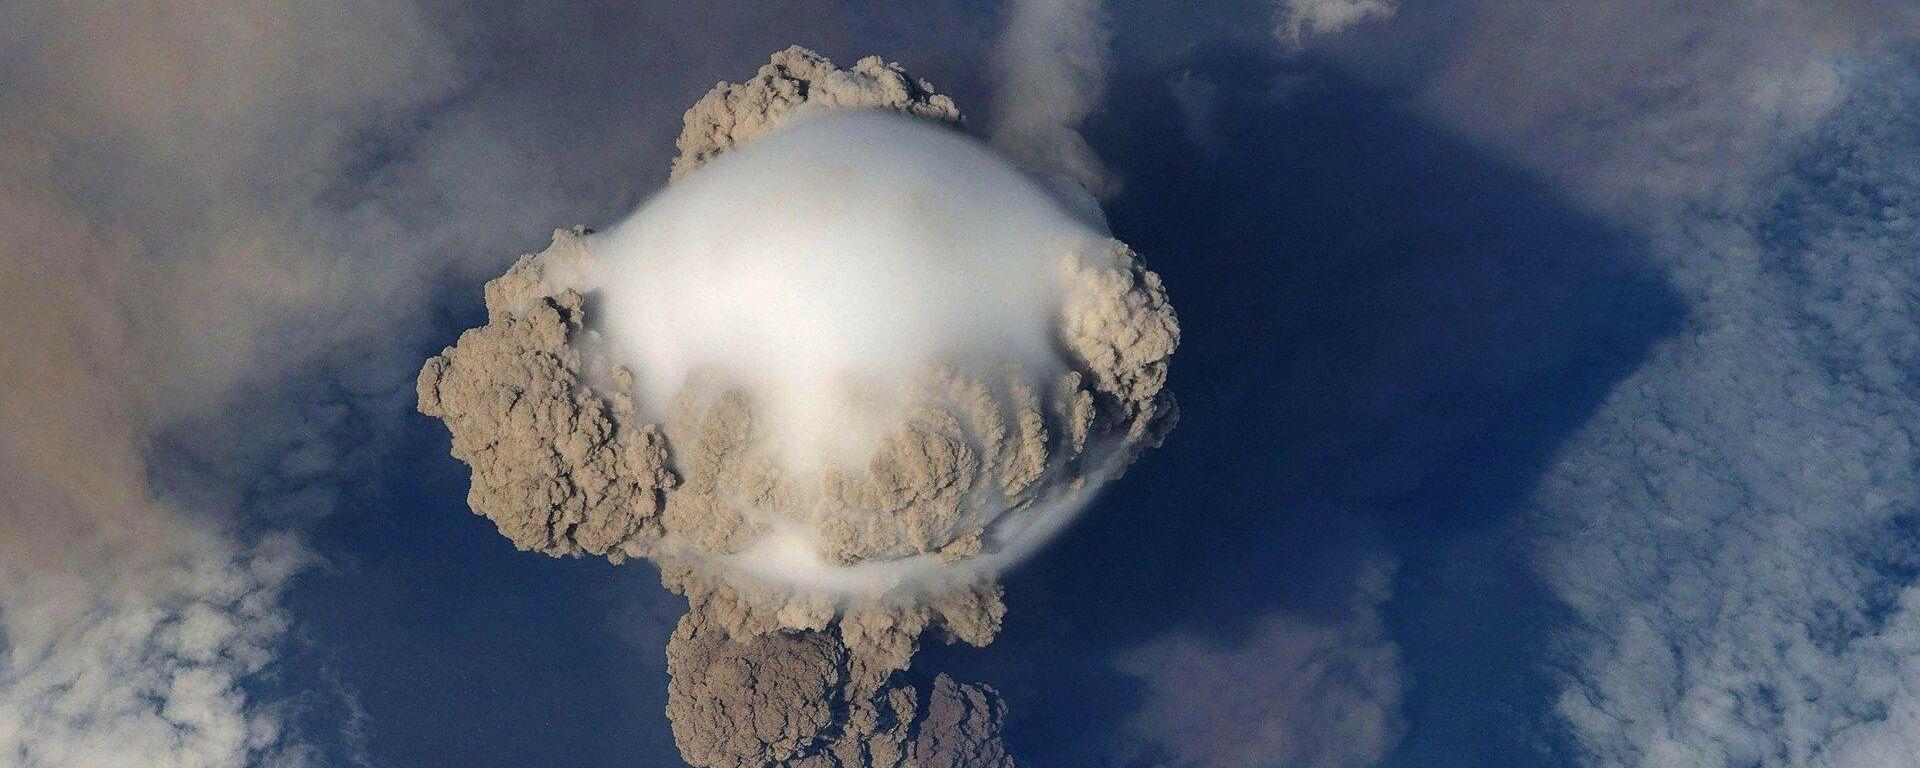 Erupción de un volcán (imagen referencial) - Sputnik Mundo, 1920, 26.05.2021